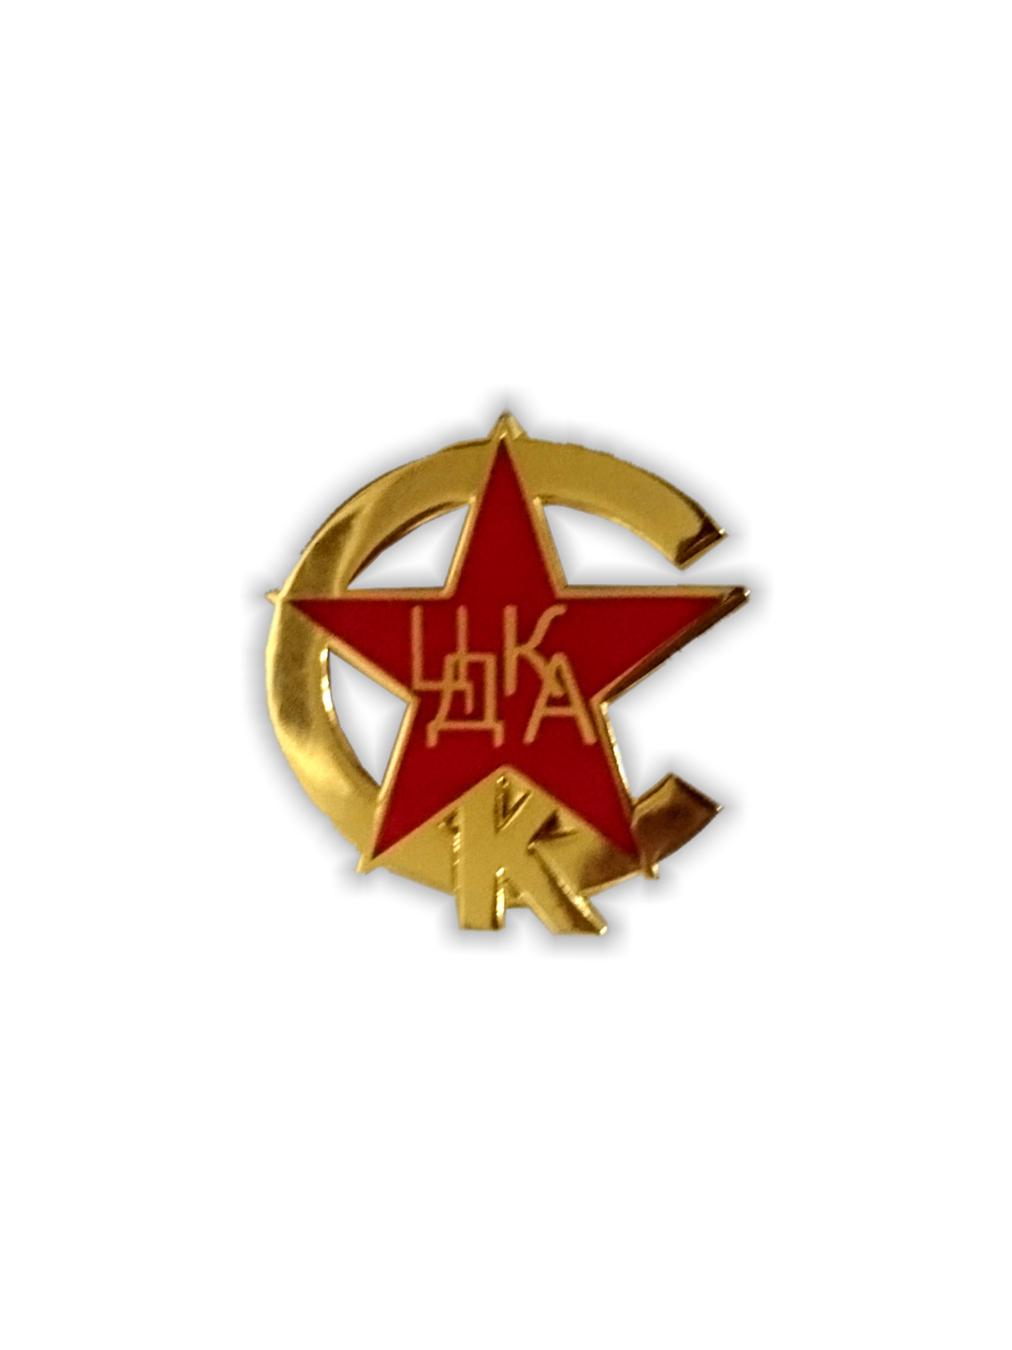 Значок эмблема ЦДКА фото